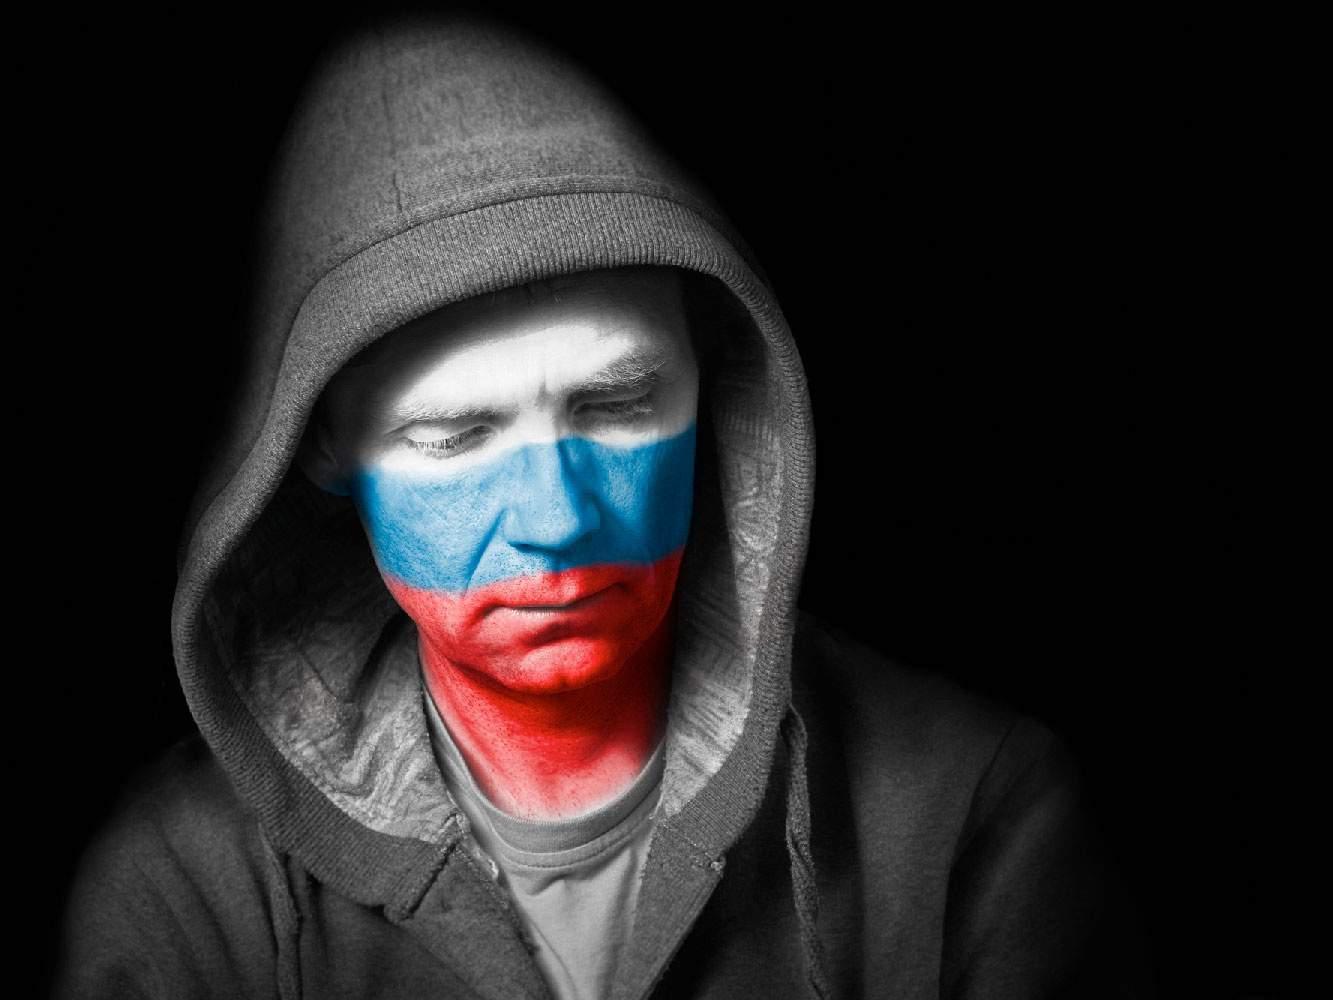 Министр спорта России назвал условия допуска фанатов на стадион